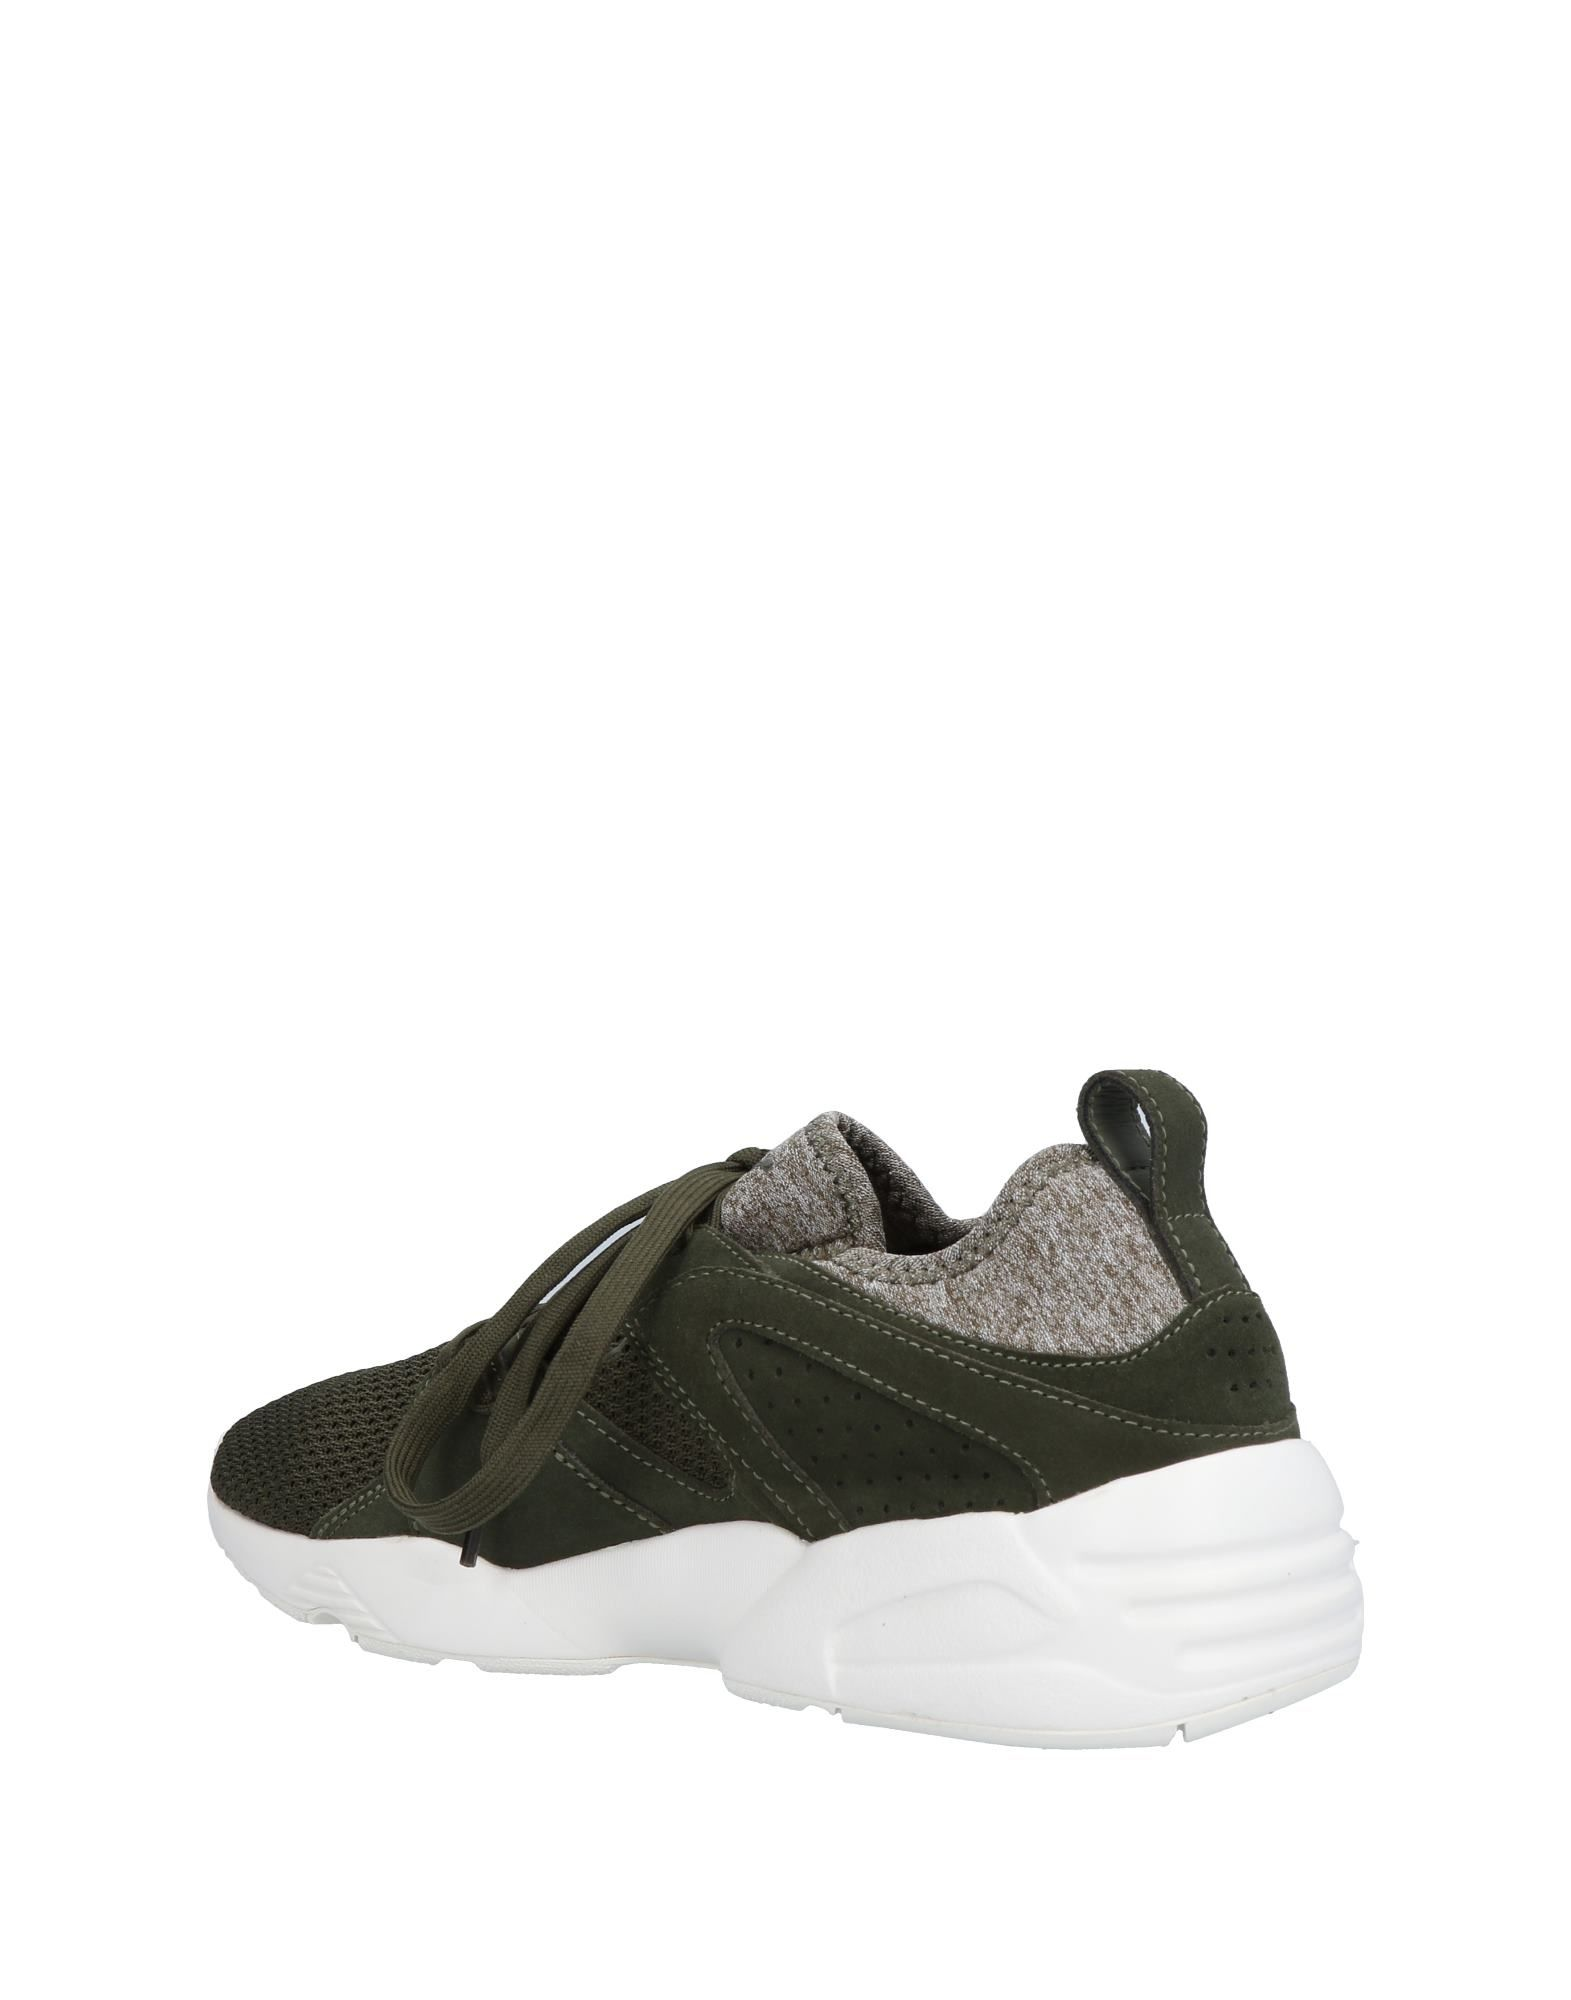 Herren Puma Sneakers Herren   11495622KQ Heiße Schuhe 2c01b0